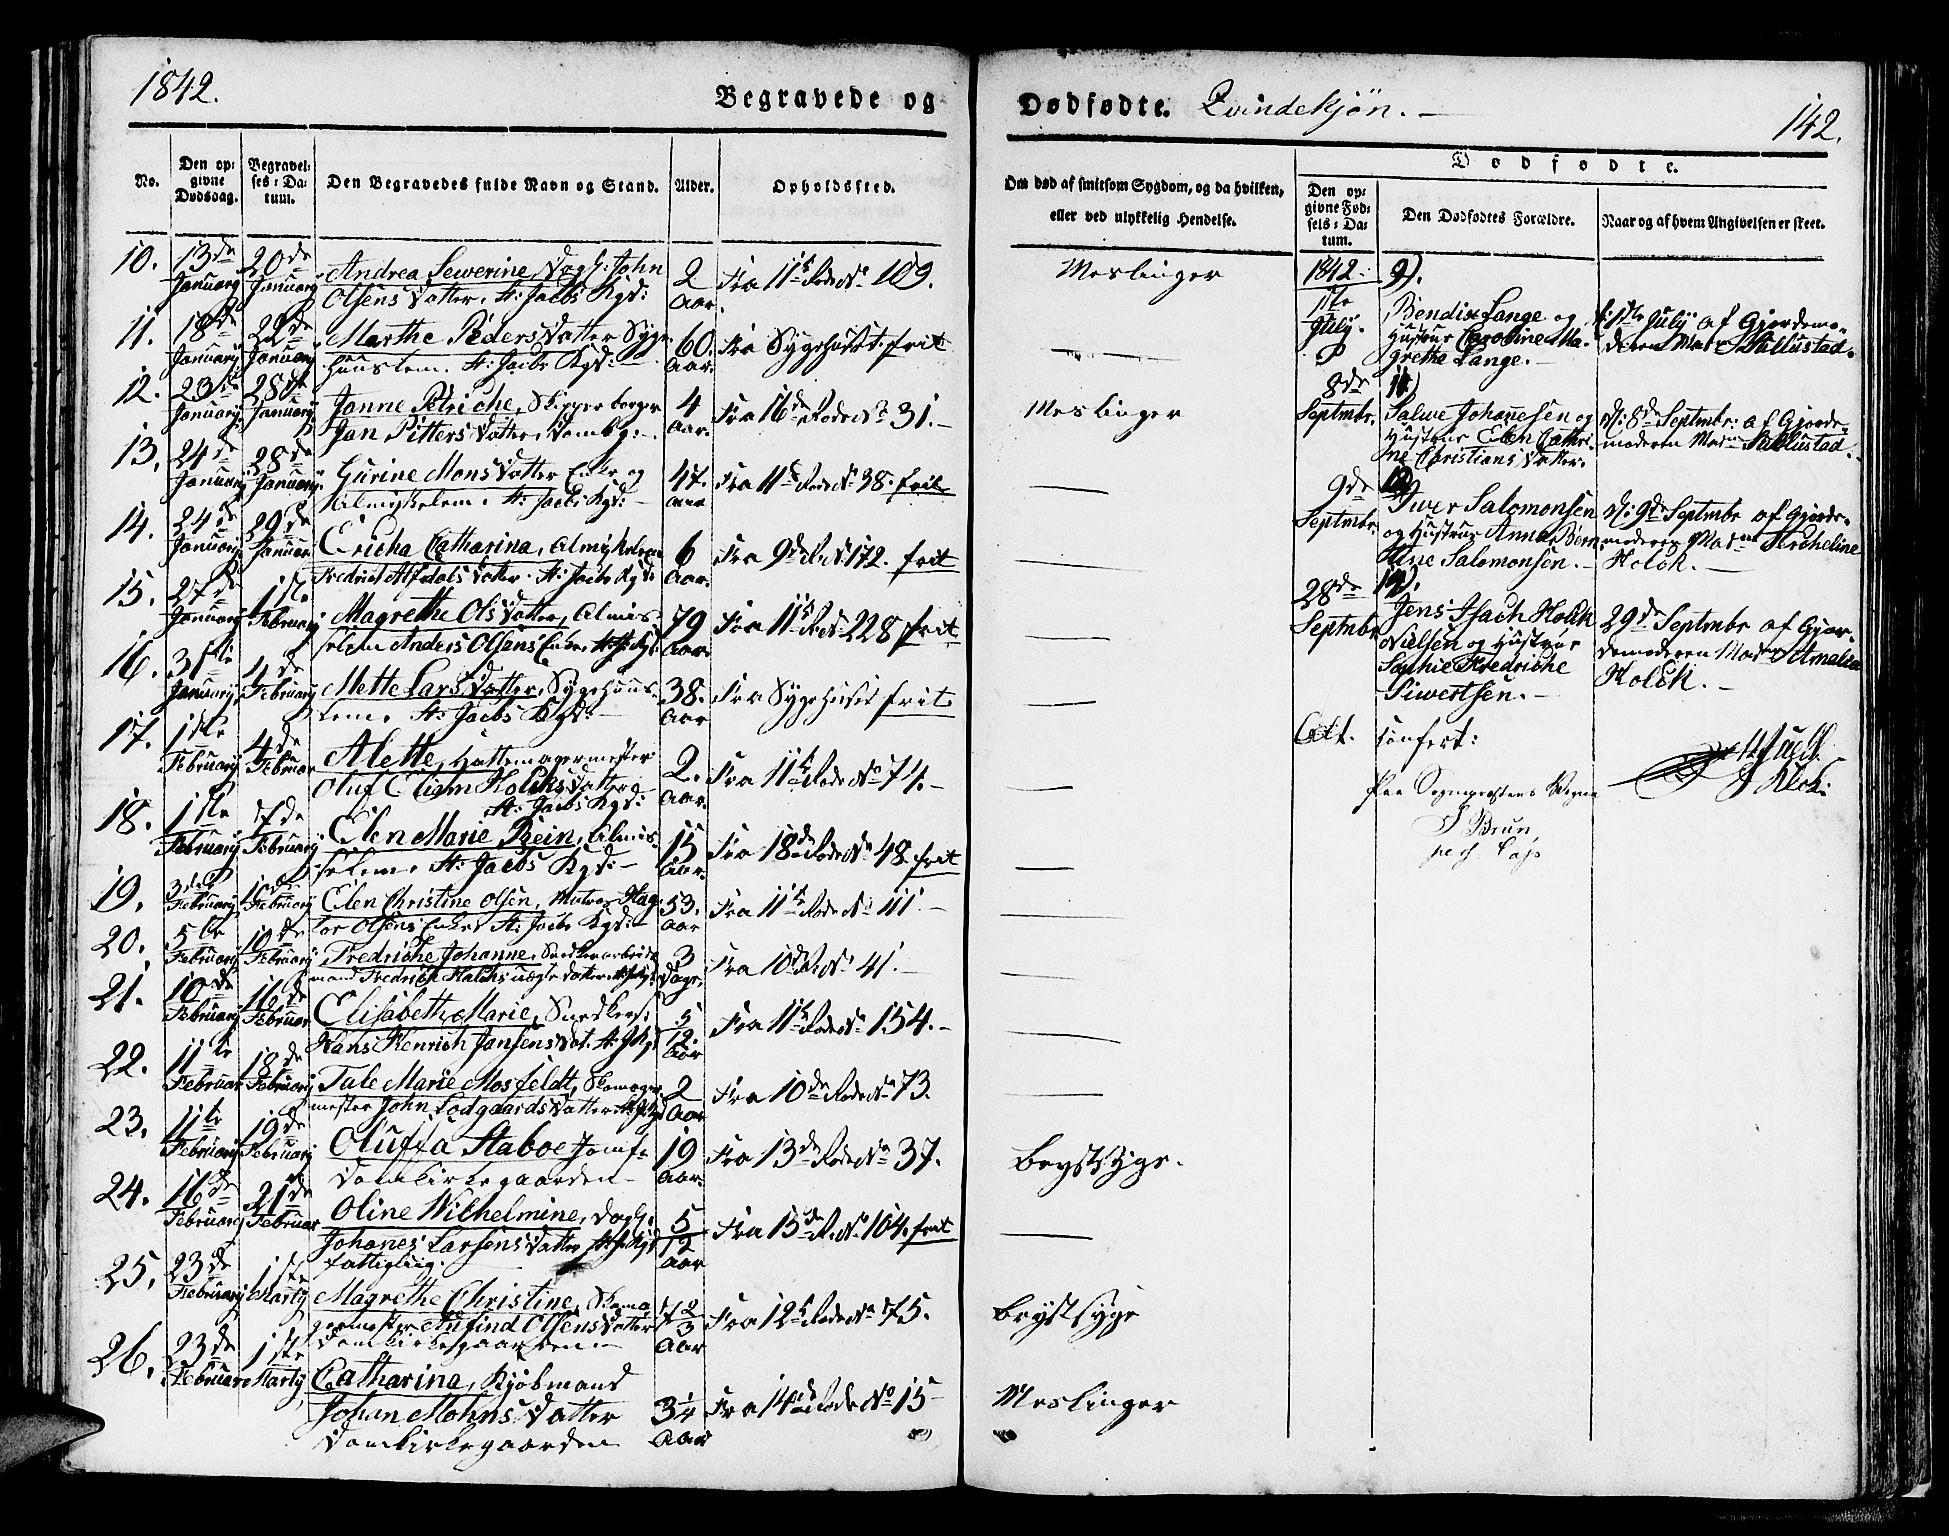 SAB, Domkirken sokneprestembete, H/Hab/L0037: Klokkerbok nr. E 1, 1836-1848, s. 142